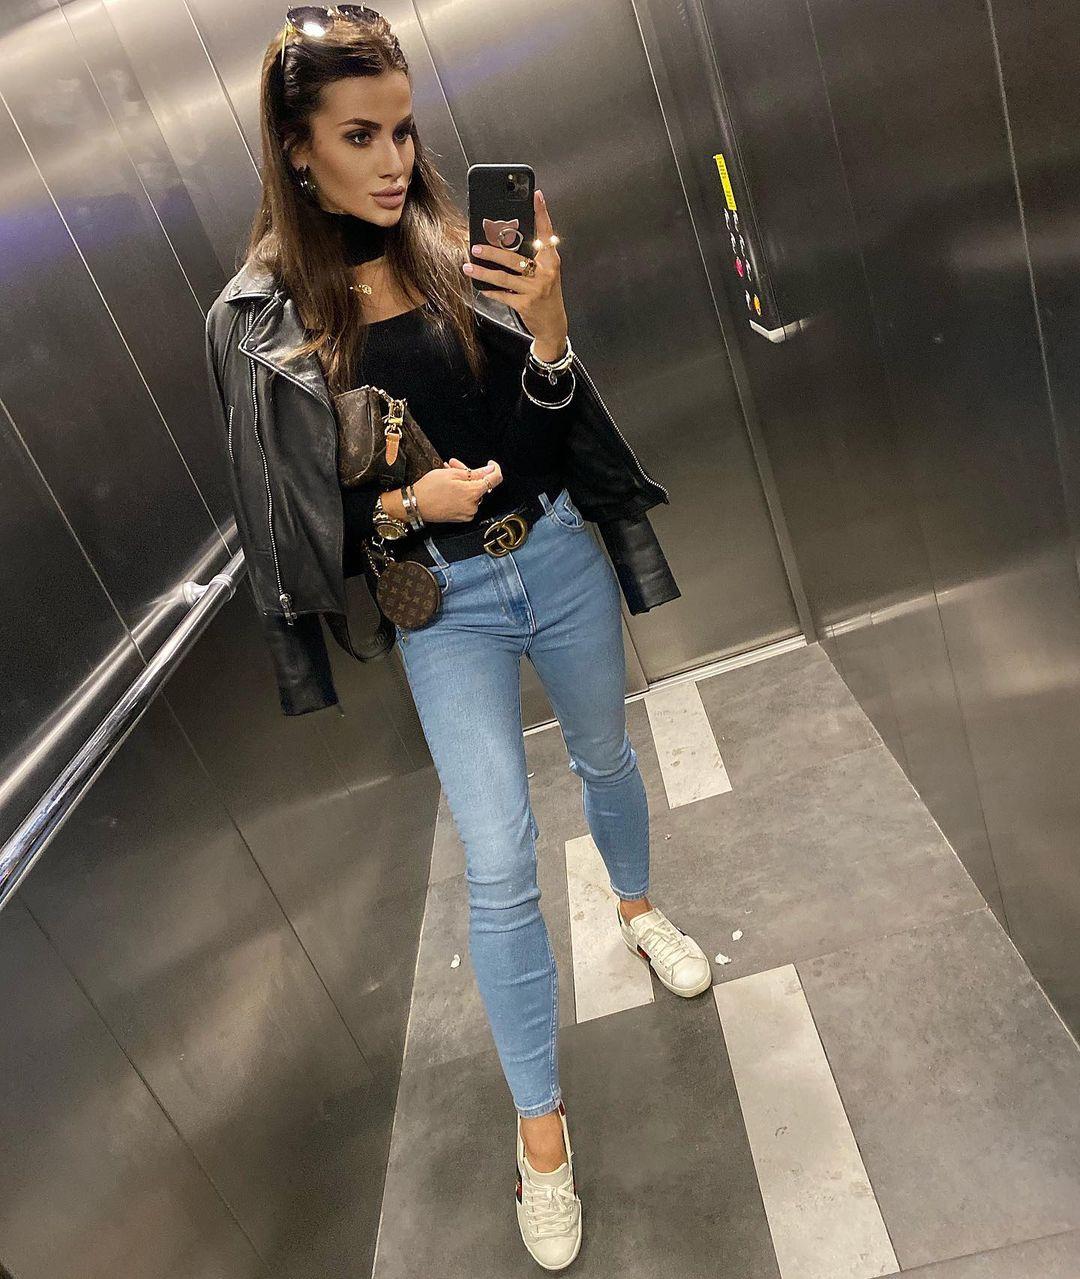 Paulina-Mai-Wallpapers-Insta-Fit-Bio-8